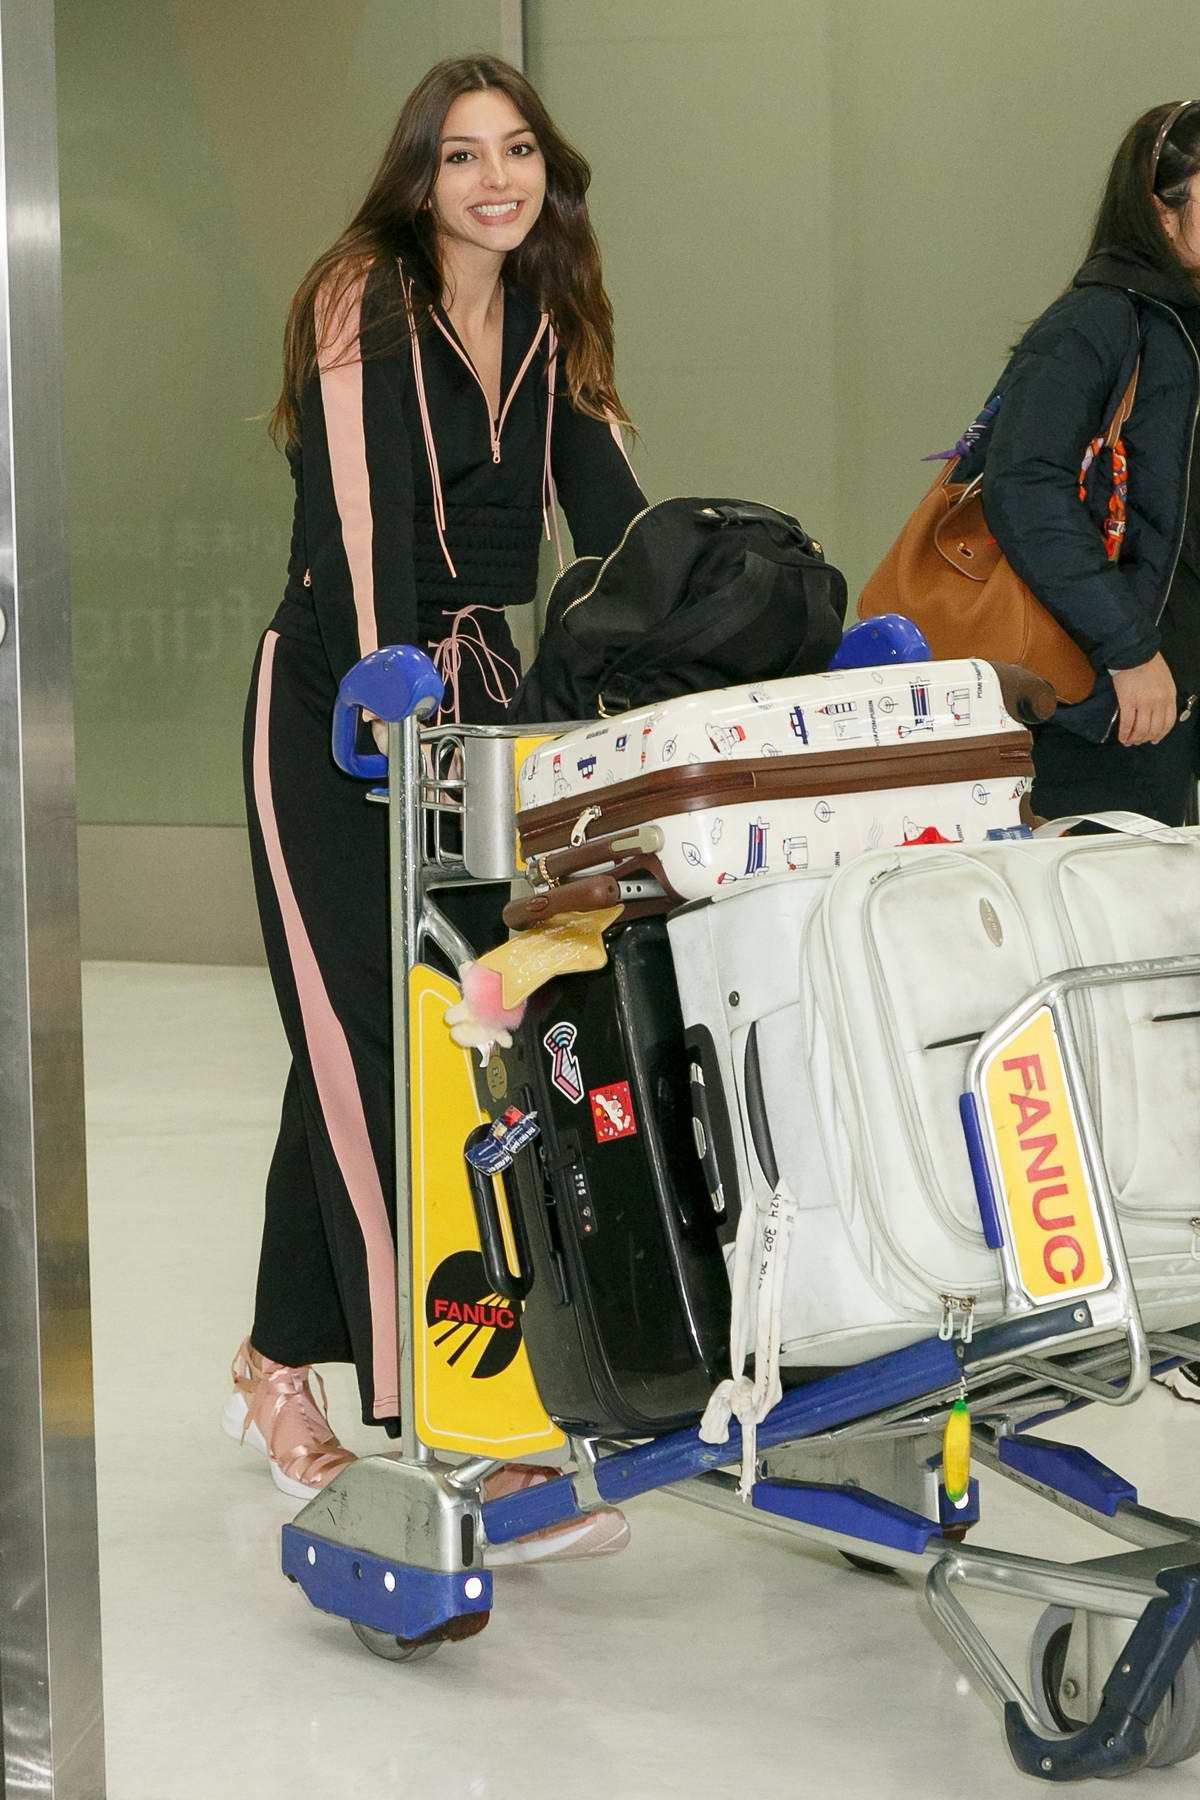 Celine Farach arrives at Narita International Airport in Tokyo, Japan